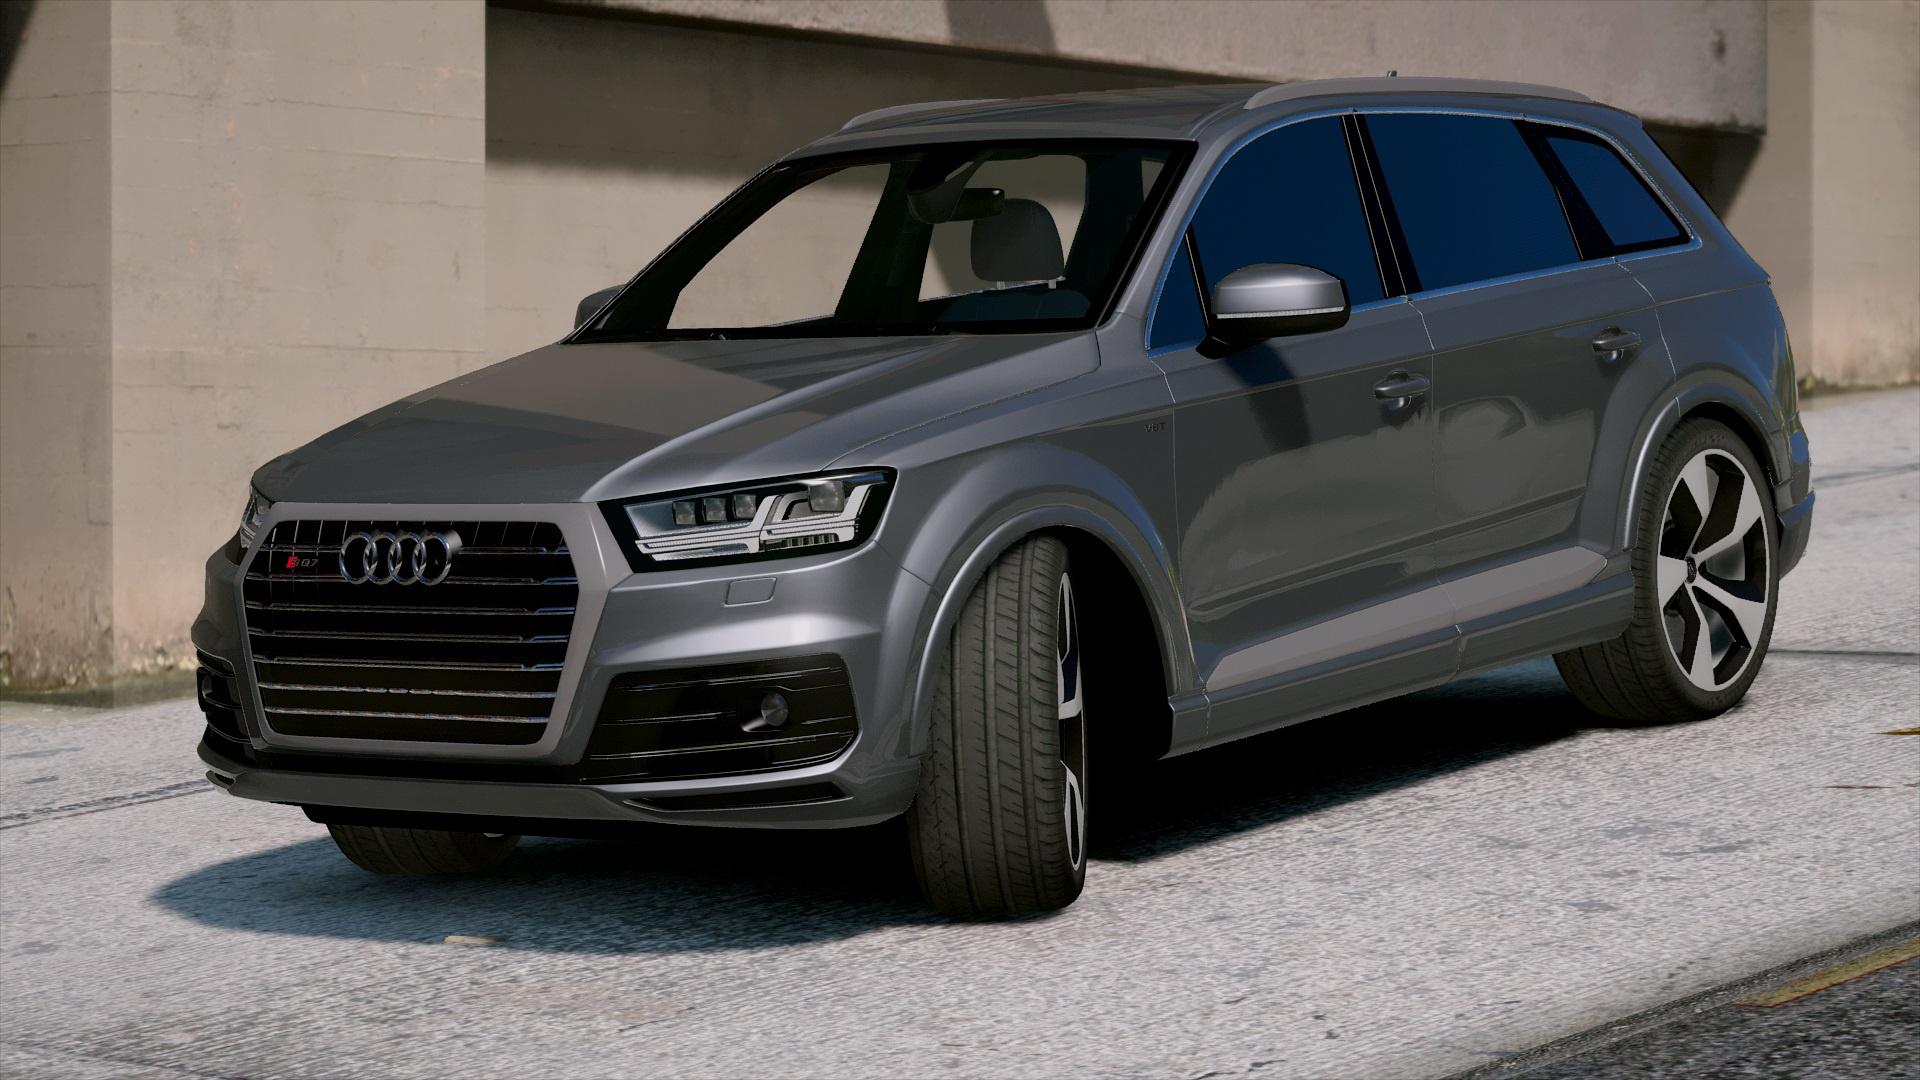 Audi SQ7 2016 [Add-On/ABT_tuning] - GTA5-Mods.com